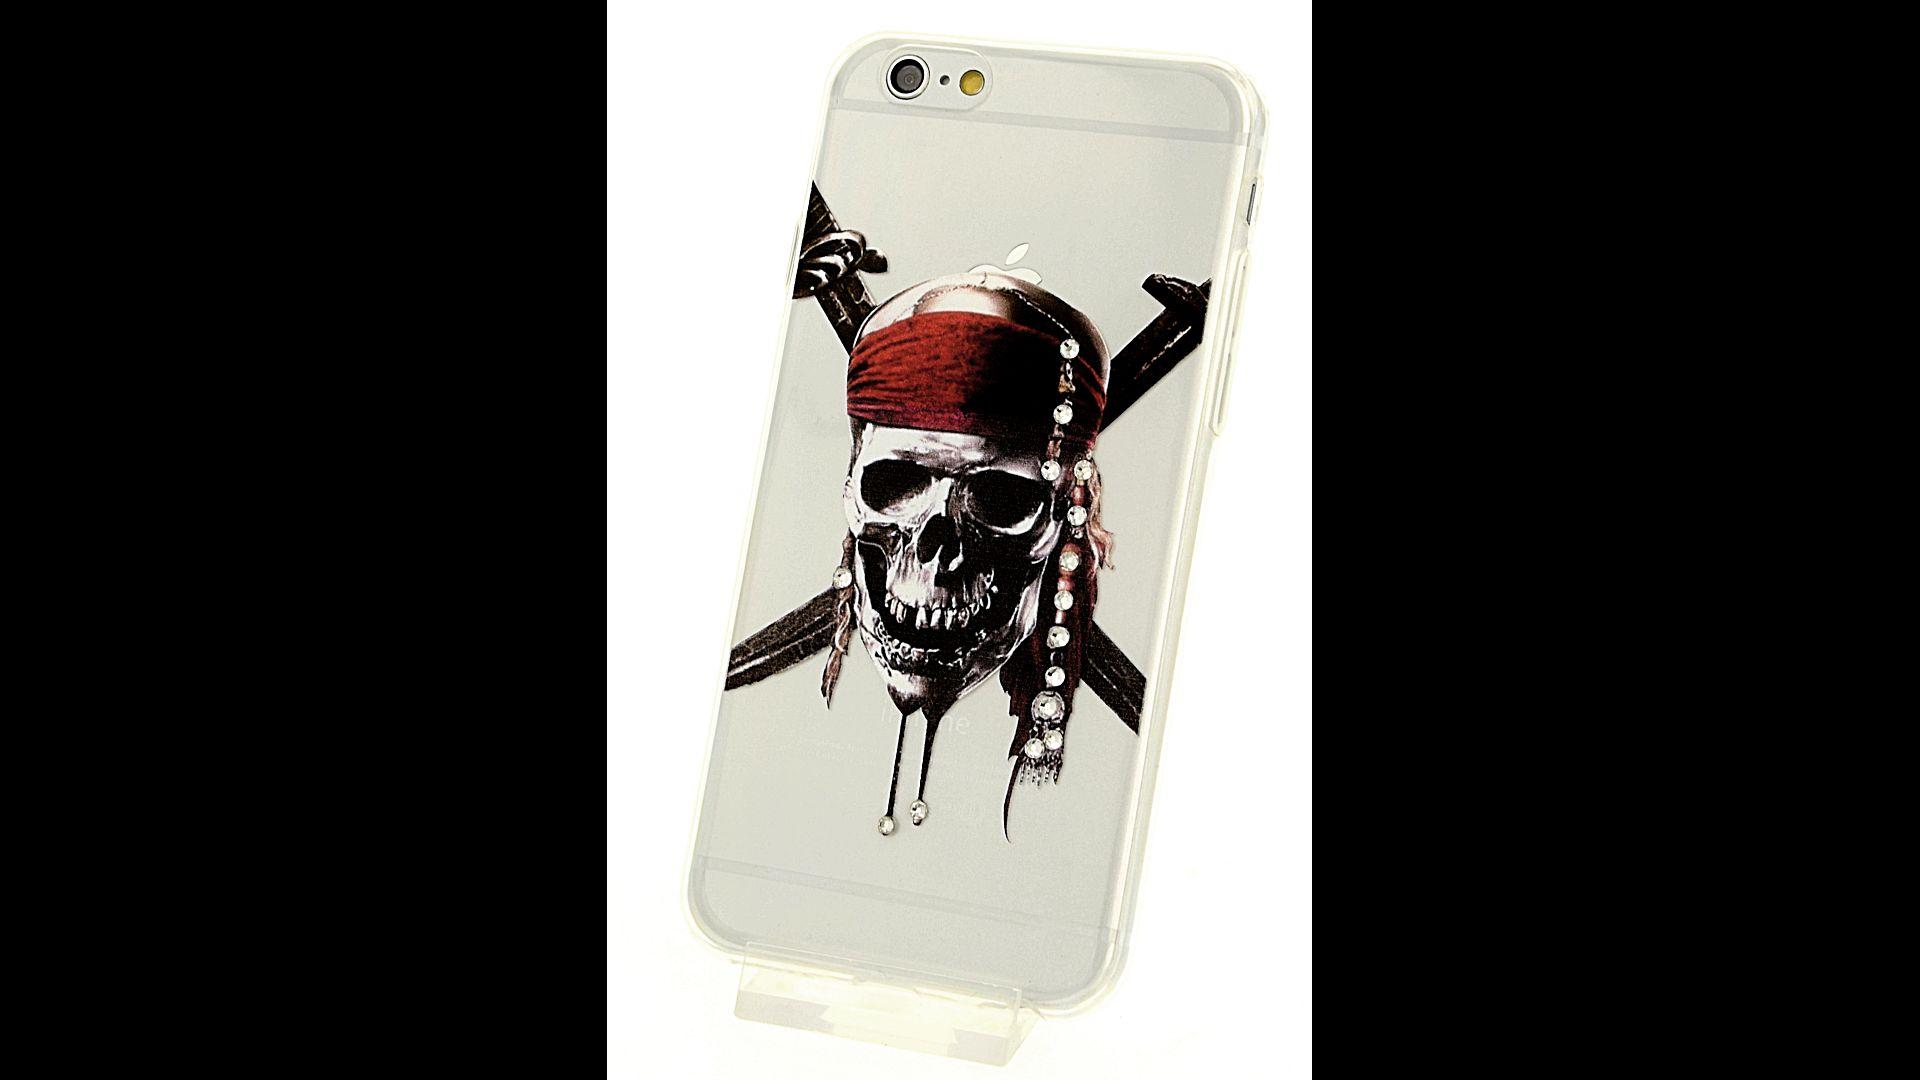 Silikonové pouzdro pro iPhone 6 a iPhone 6S Piráti z Karibiku